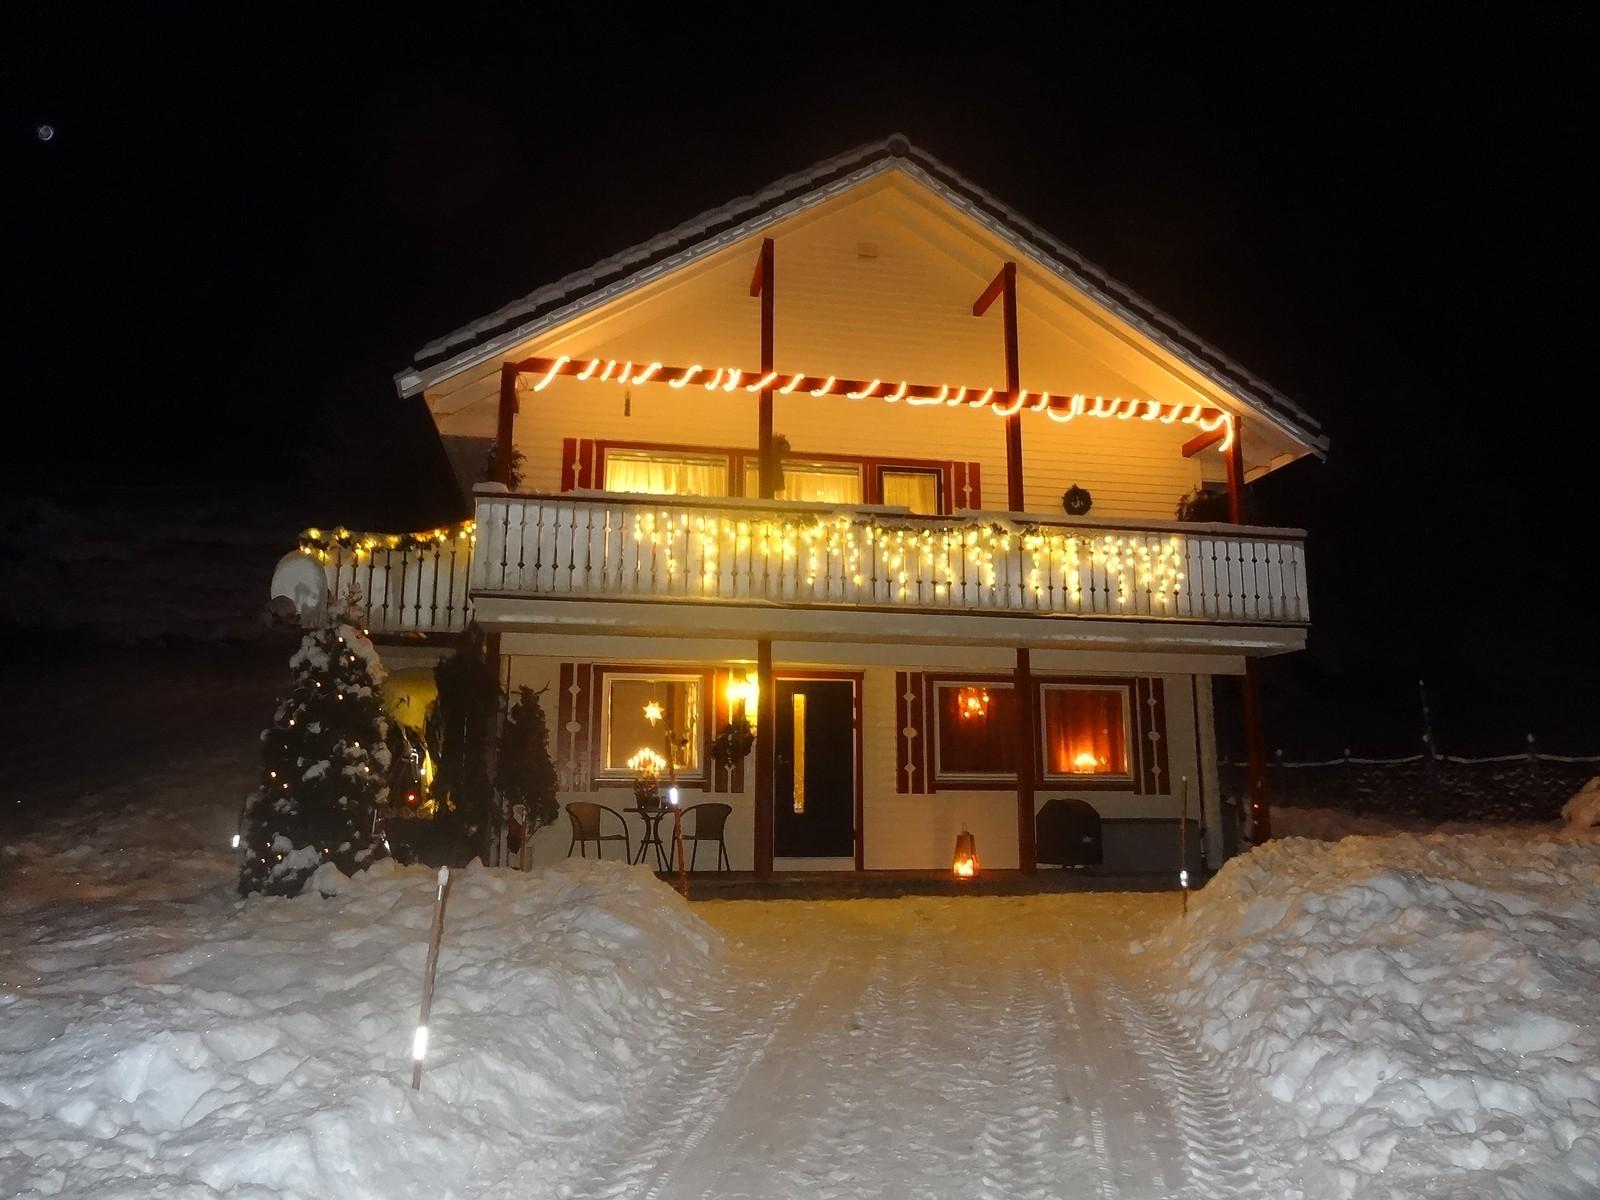 Julepynta hus i Viksdalen